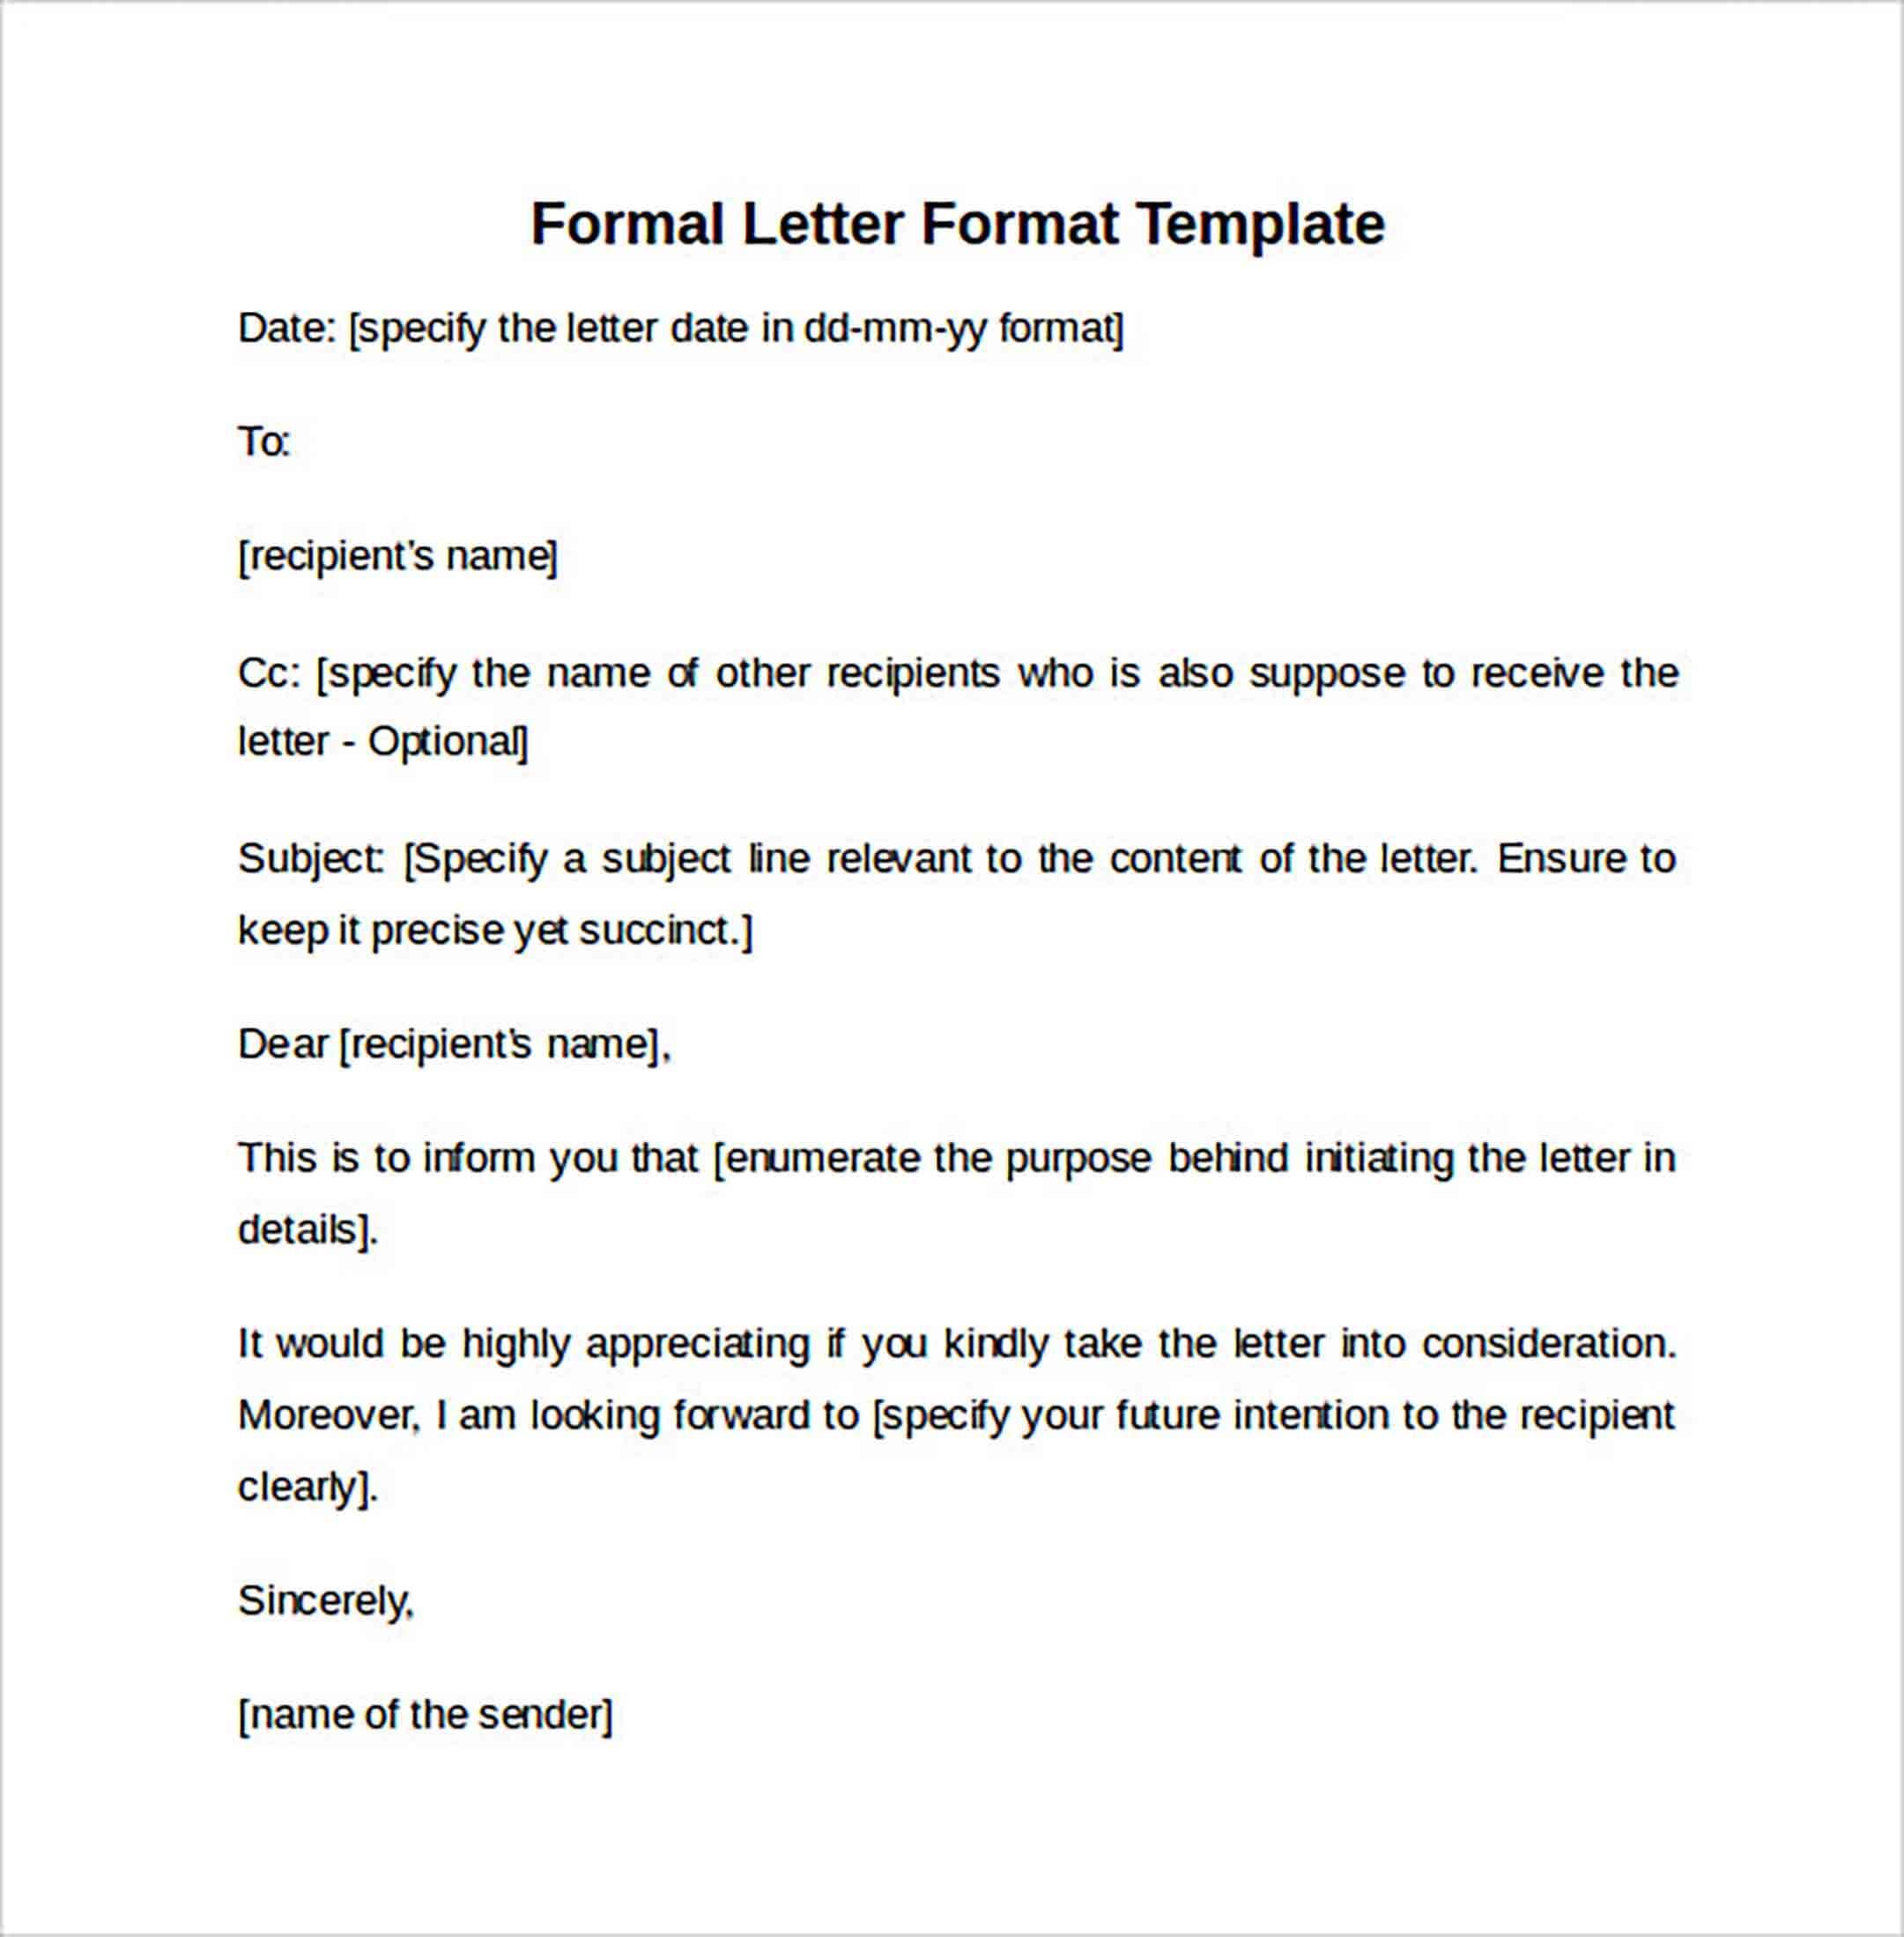 Formal Letter Format templates